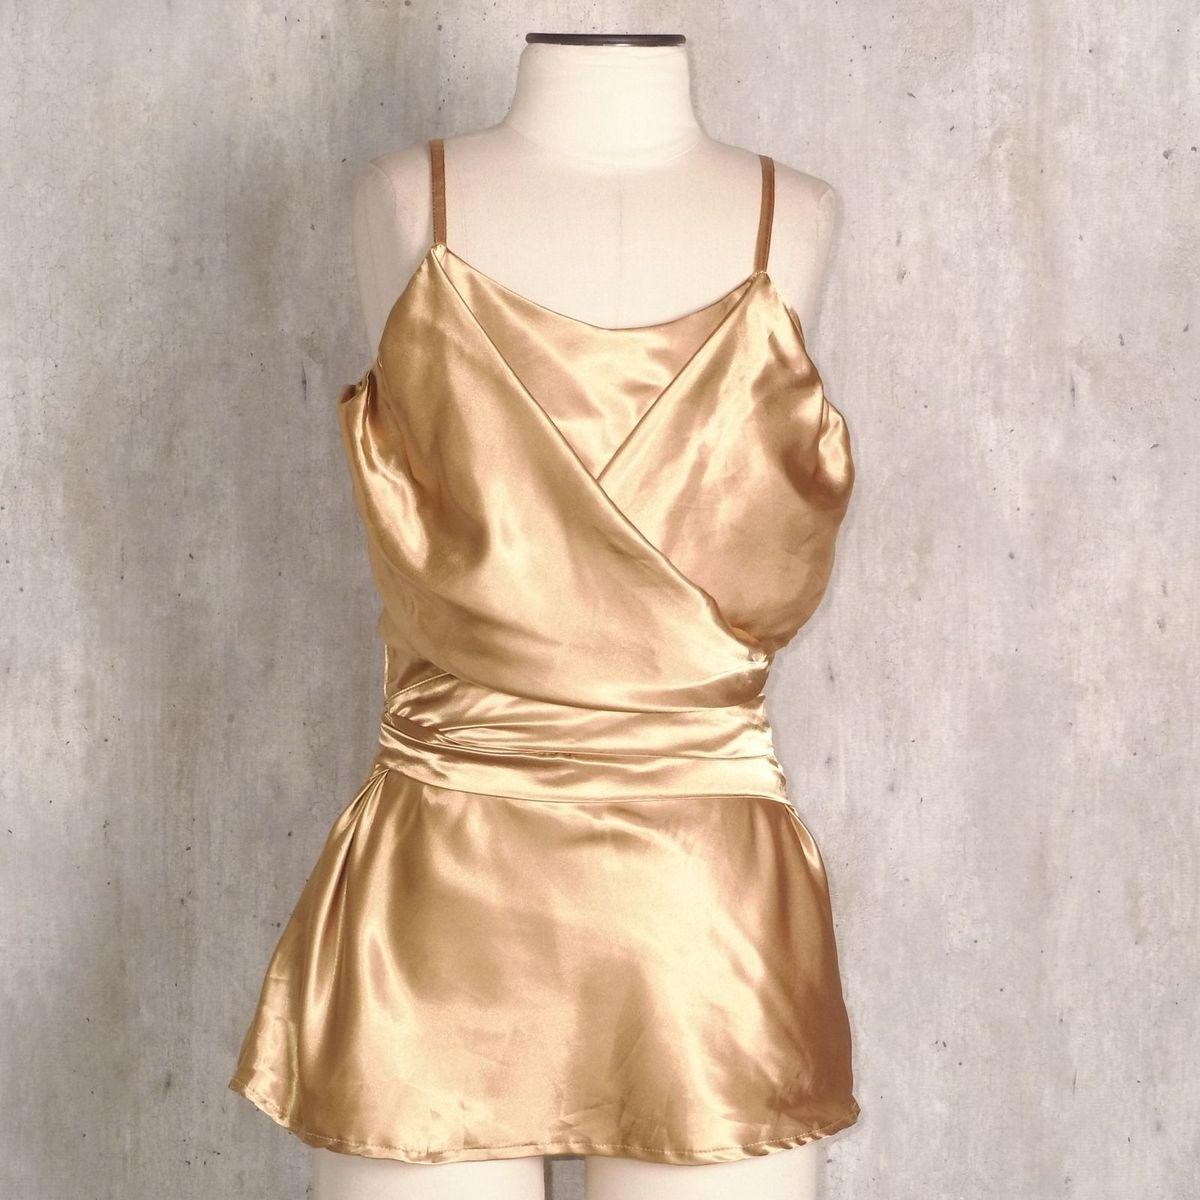 80790a499 Blusa de Cetim Dourada | Blusa Feminina Anne Kanner Usado 31356124 | enjoei